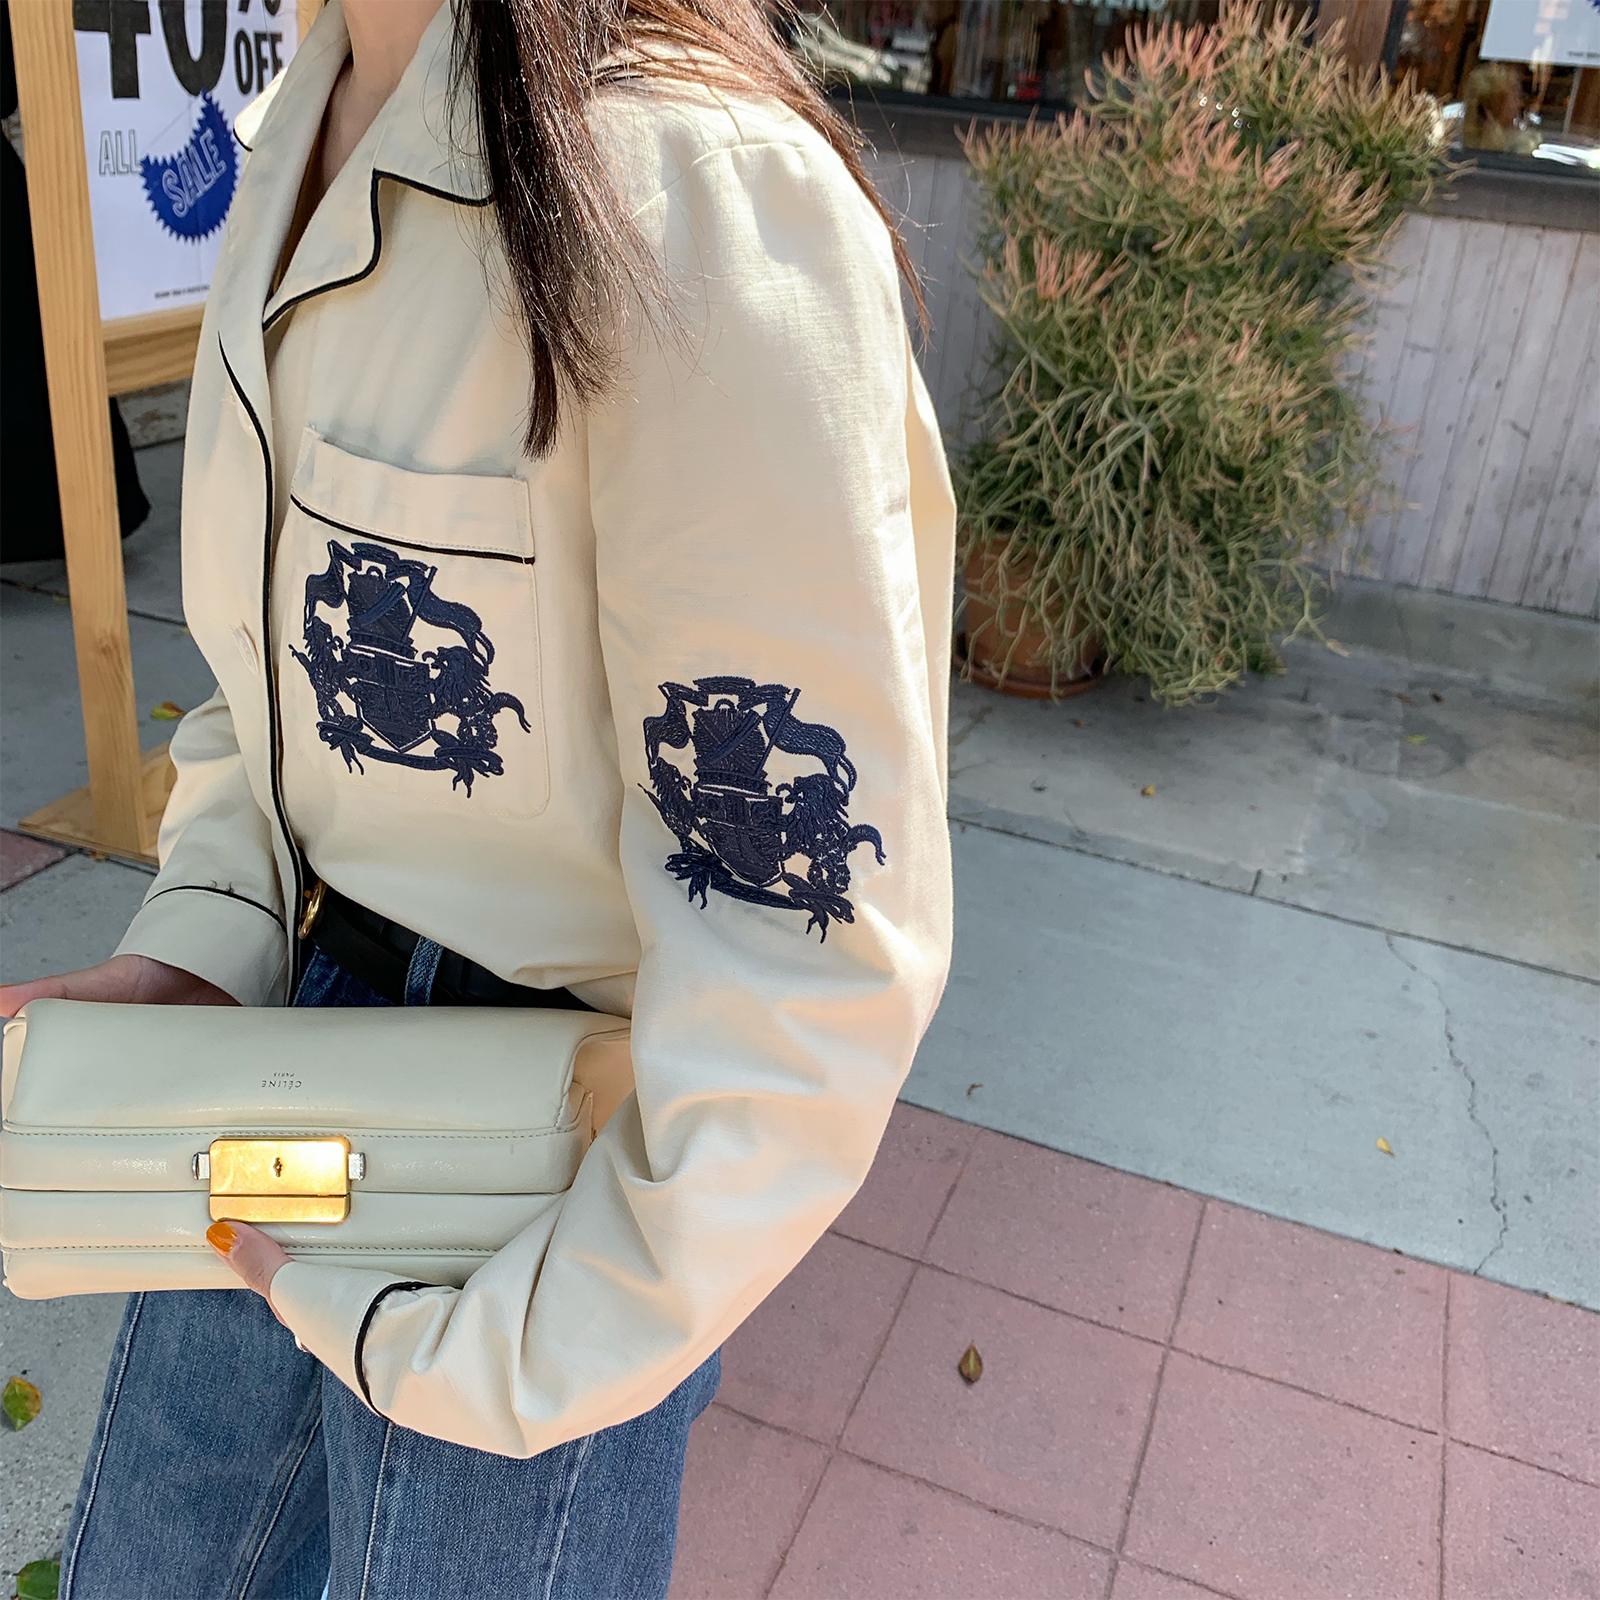 vcruan阿希哥 外套女2019新款夏季韩版宽松薄款上衣复古刺绣夹克